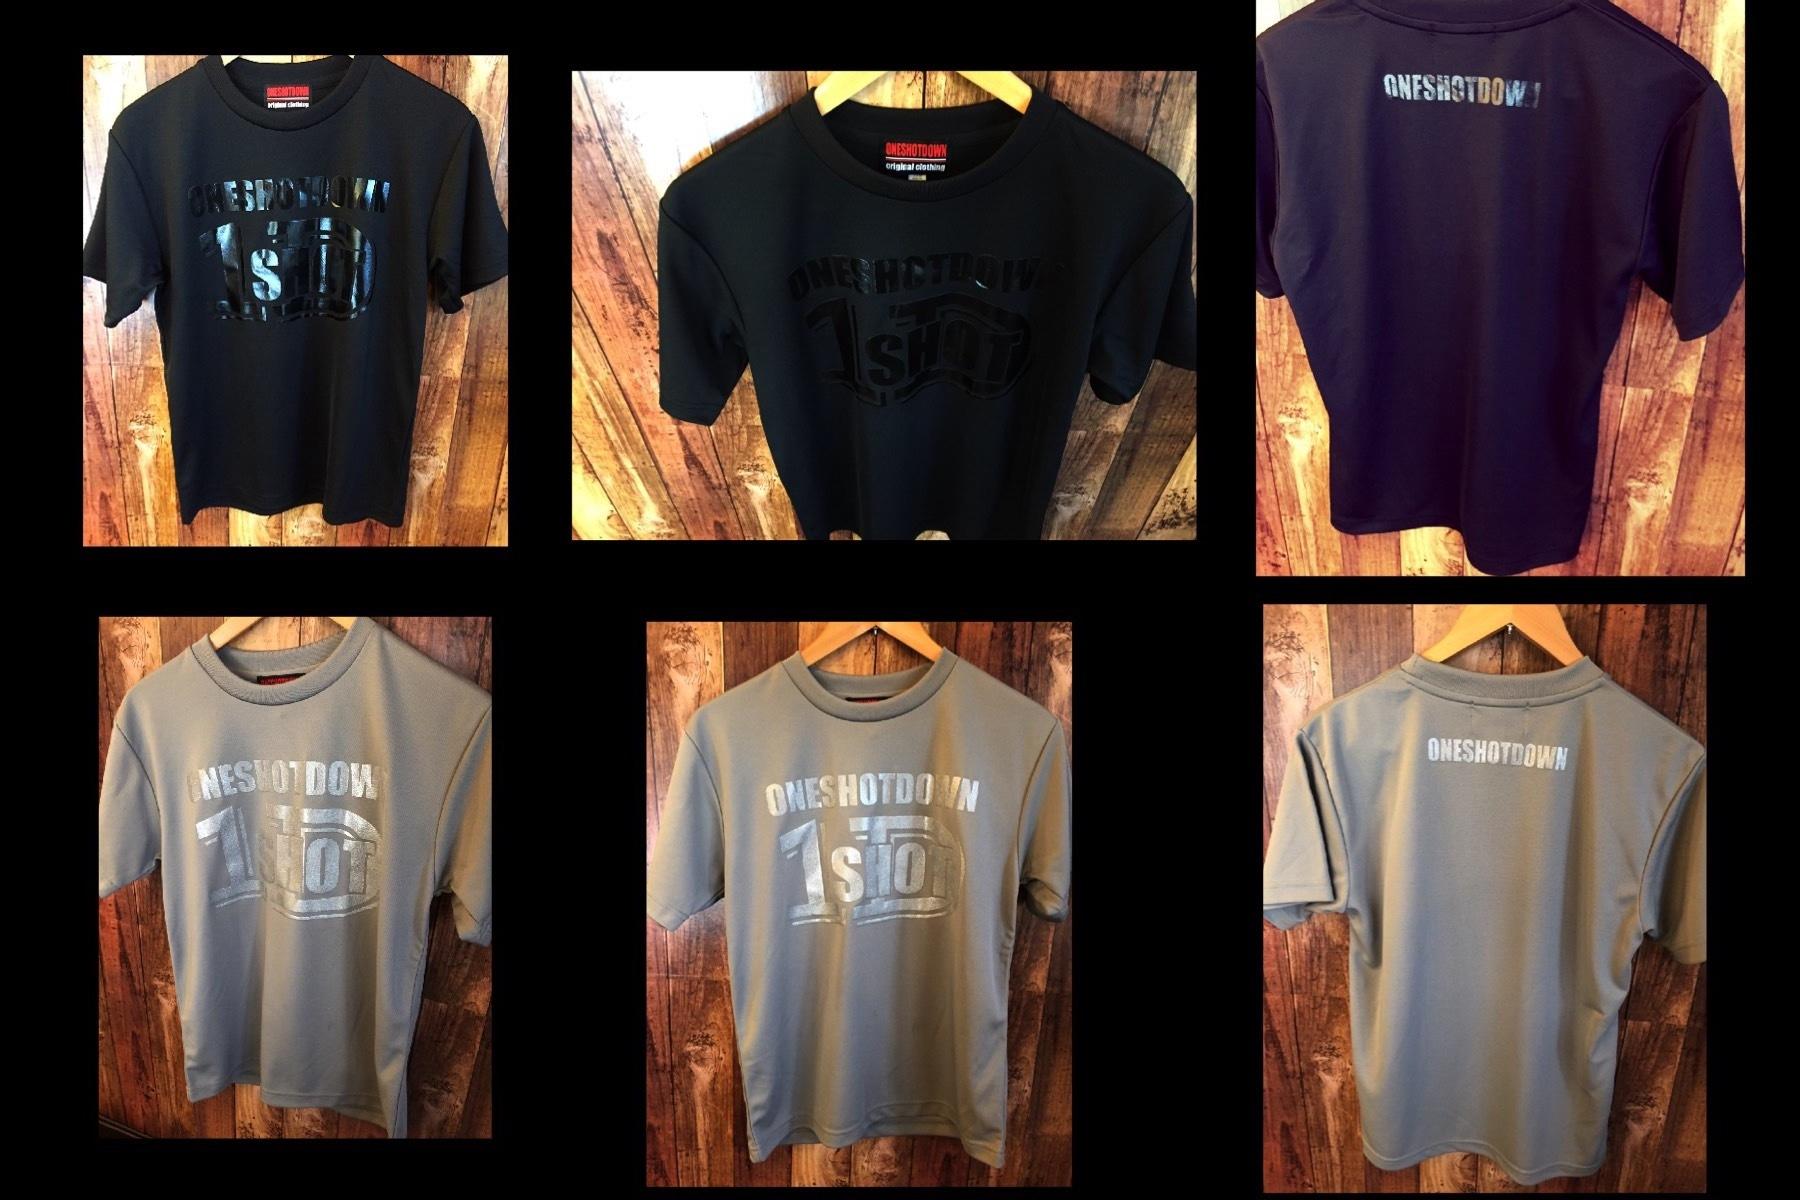 ONESHOTDOWN ロゴ ドライTシャツ - 画像5